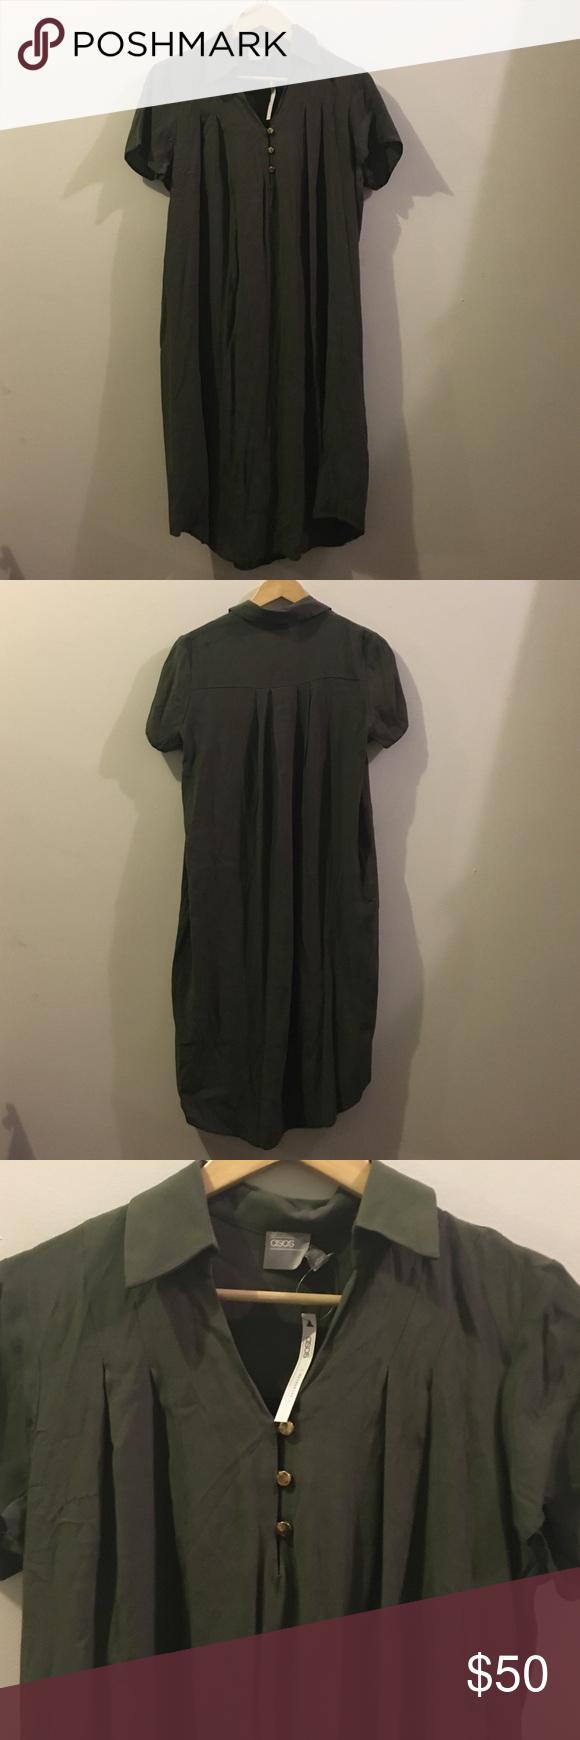 New asos dark green maternity collar shirt dress nwt collared